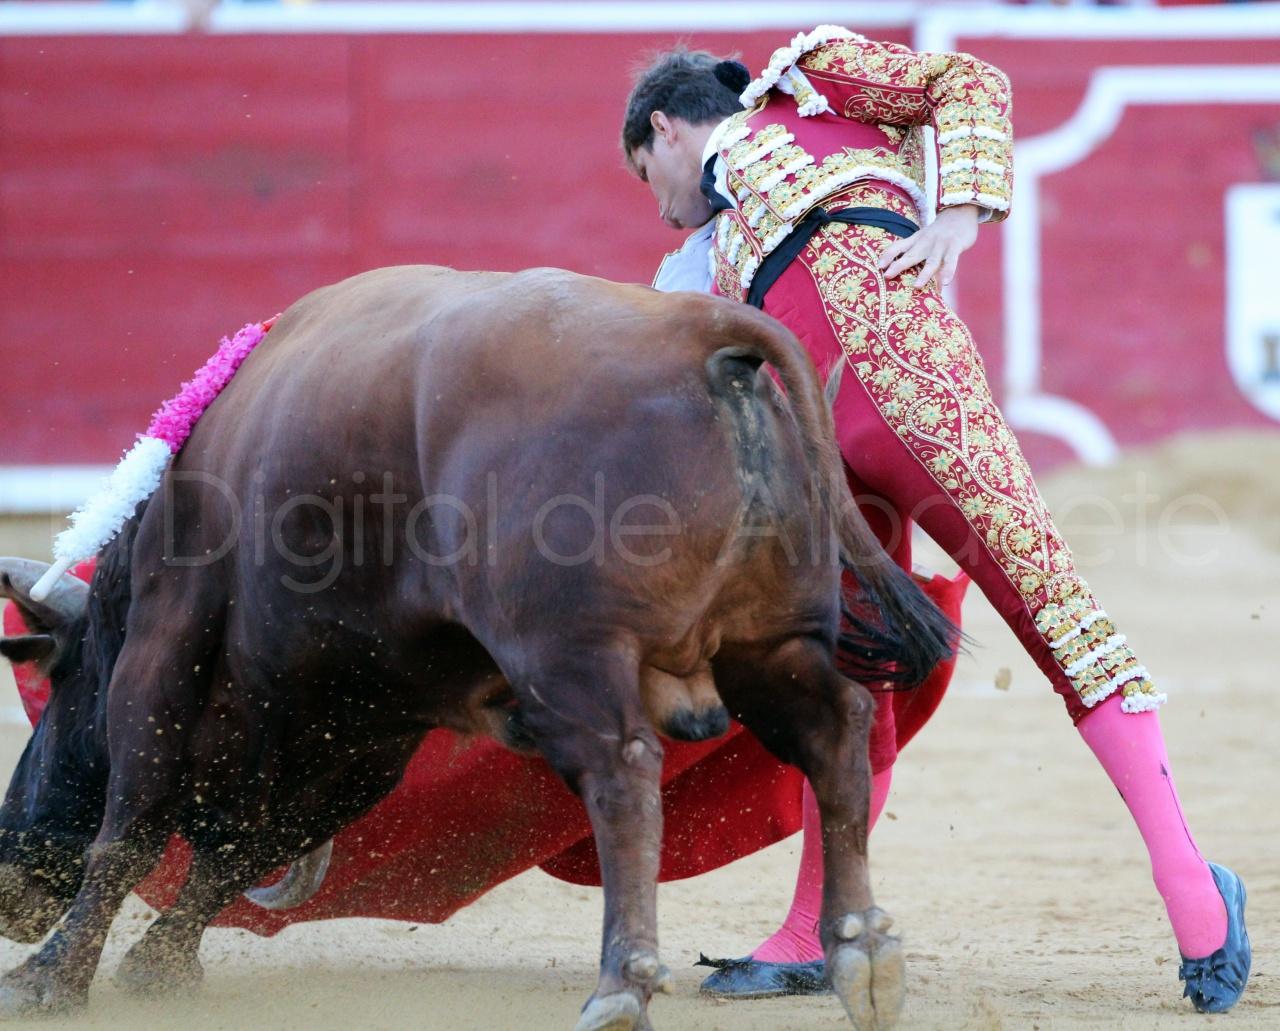 El Juli Lopez Simon y Garrido Feria Albacete 2015 toros  91